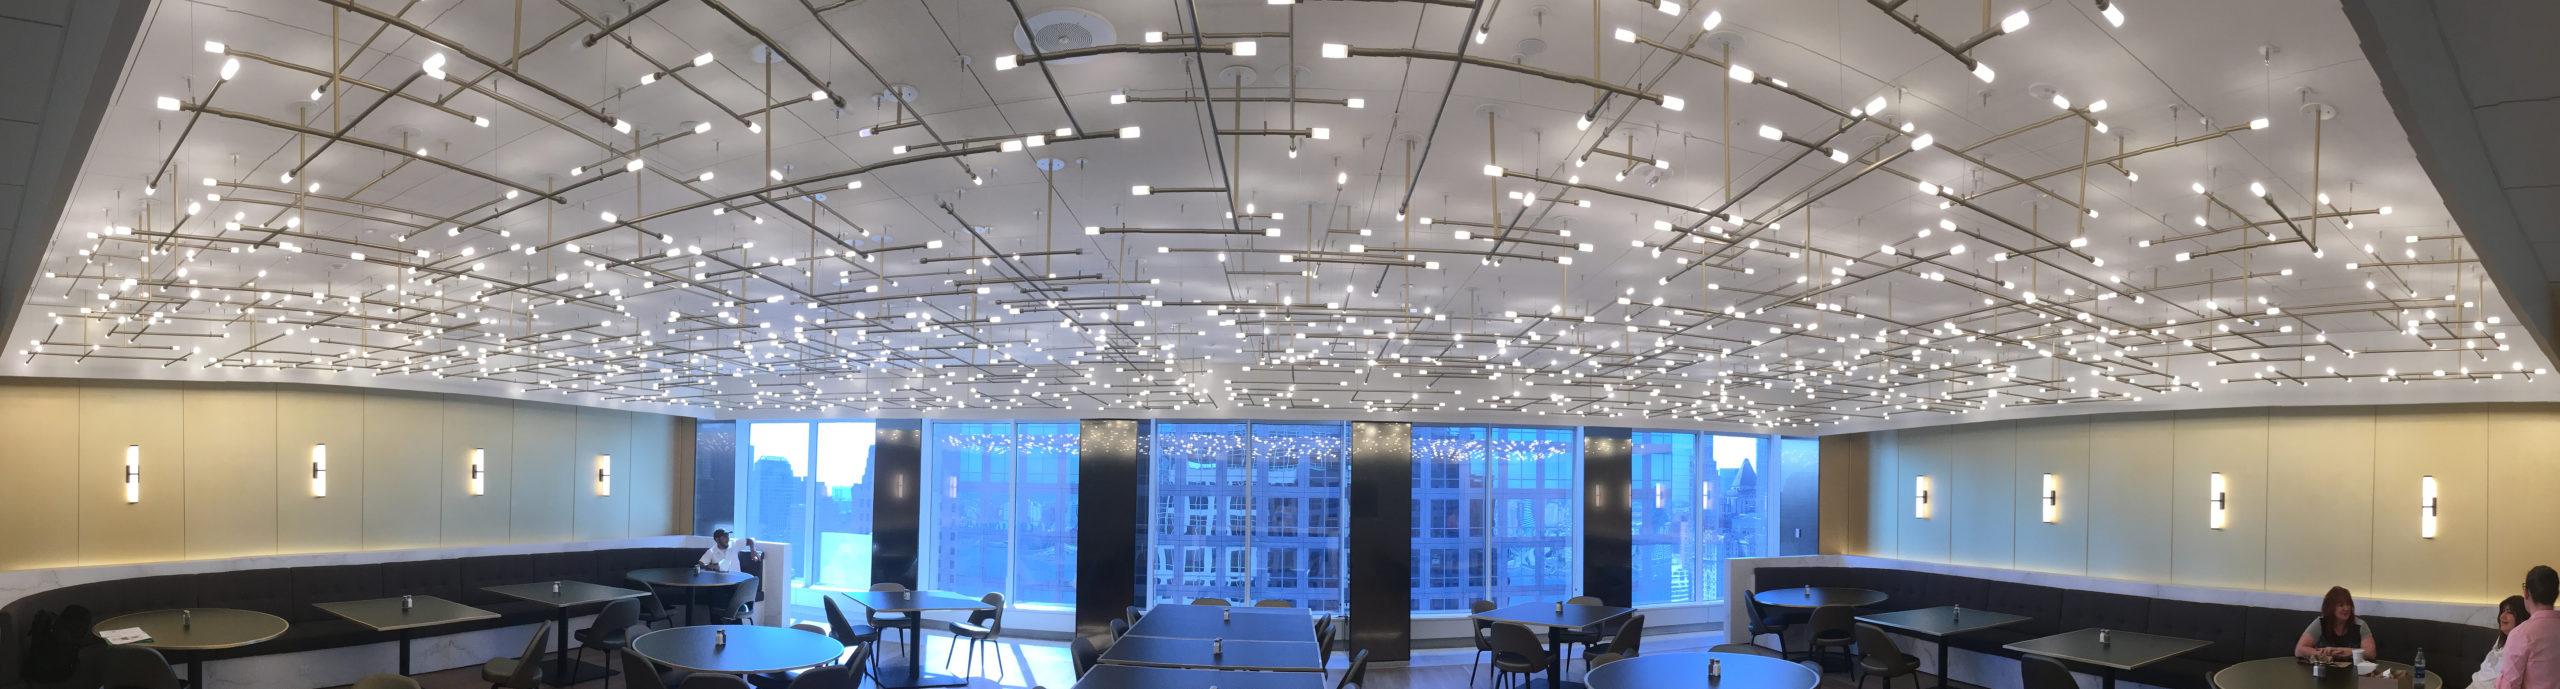 #235021 Sticks & Stars- Jones Day HQ, NYC